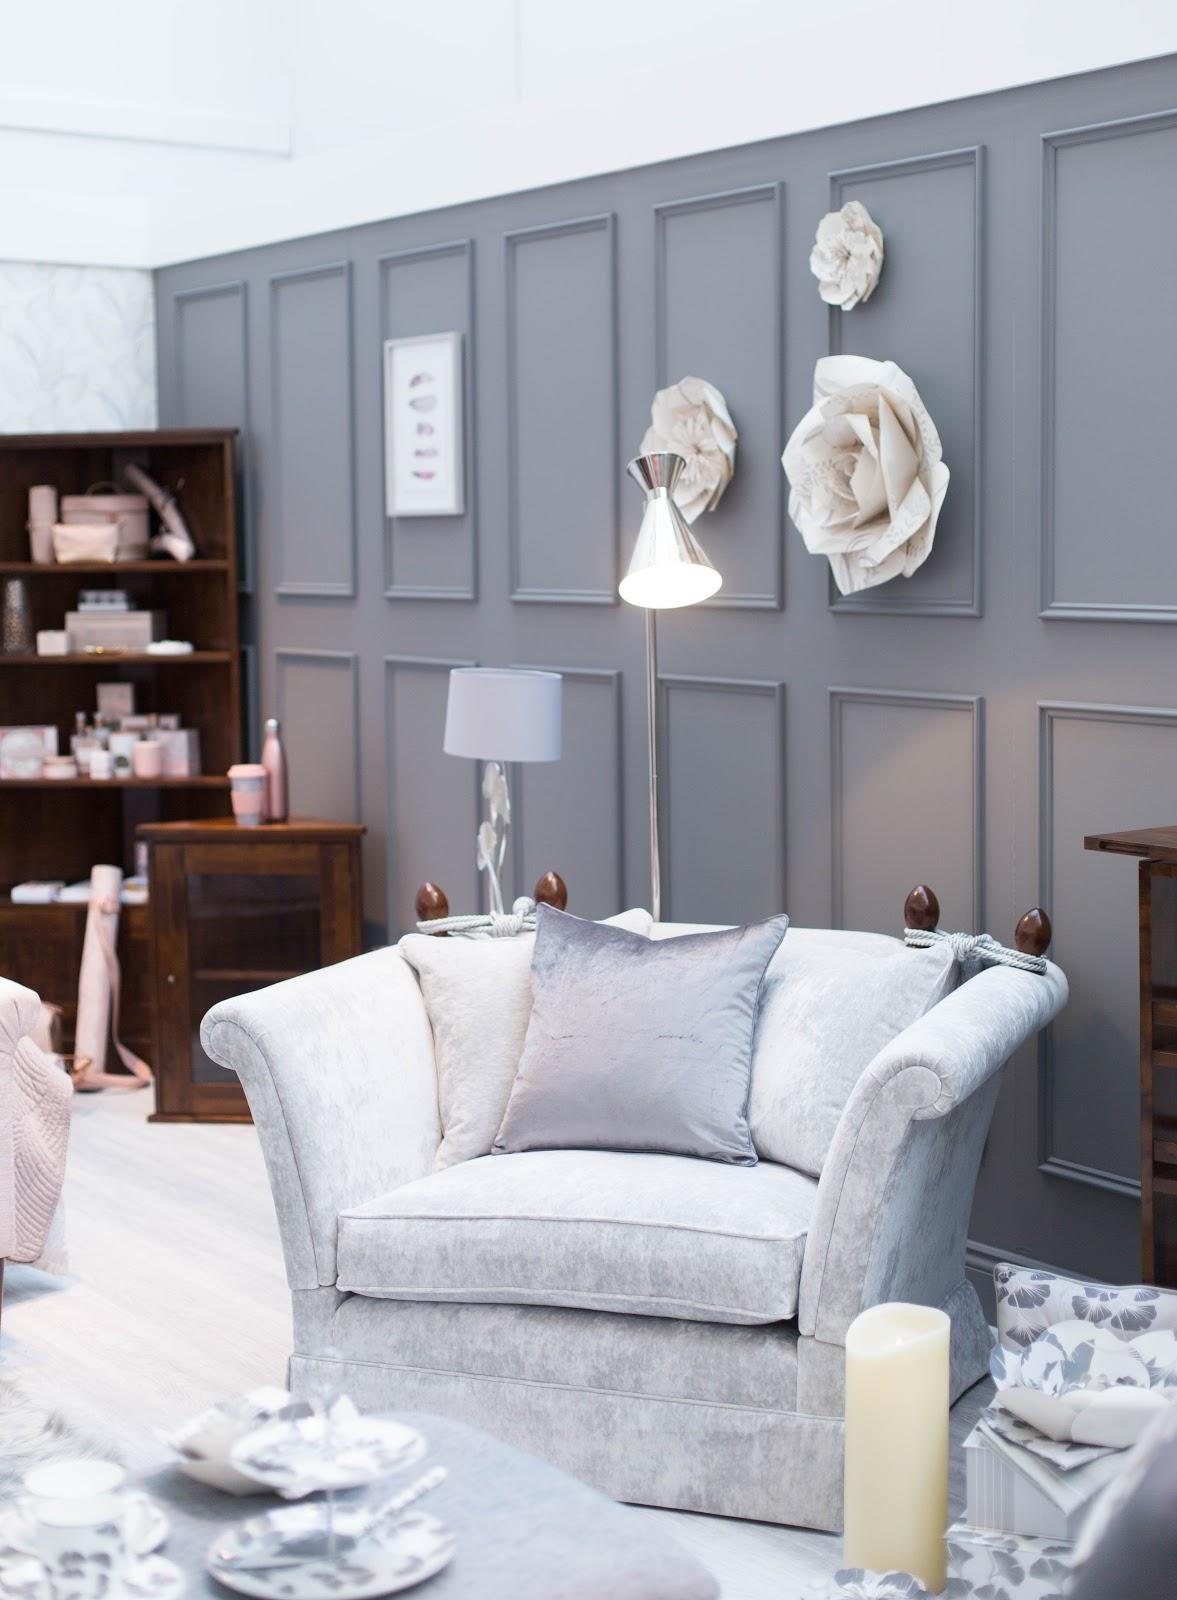 laura ashley interior design service reviews